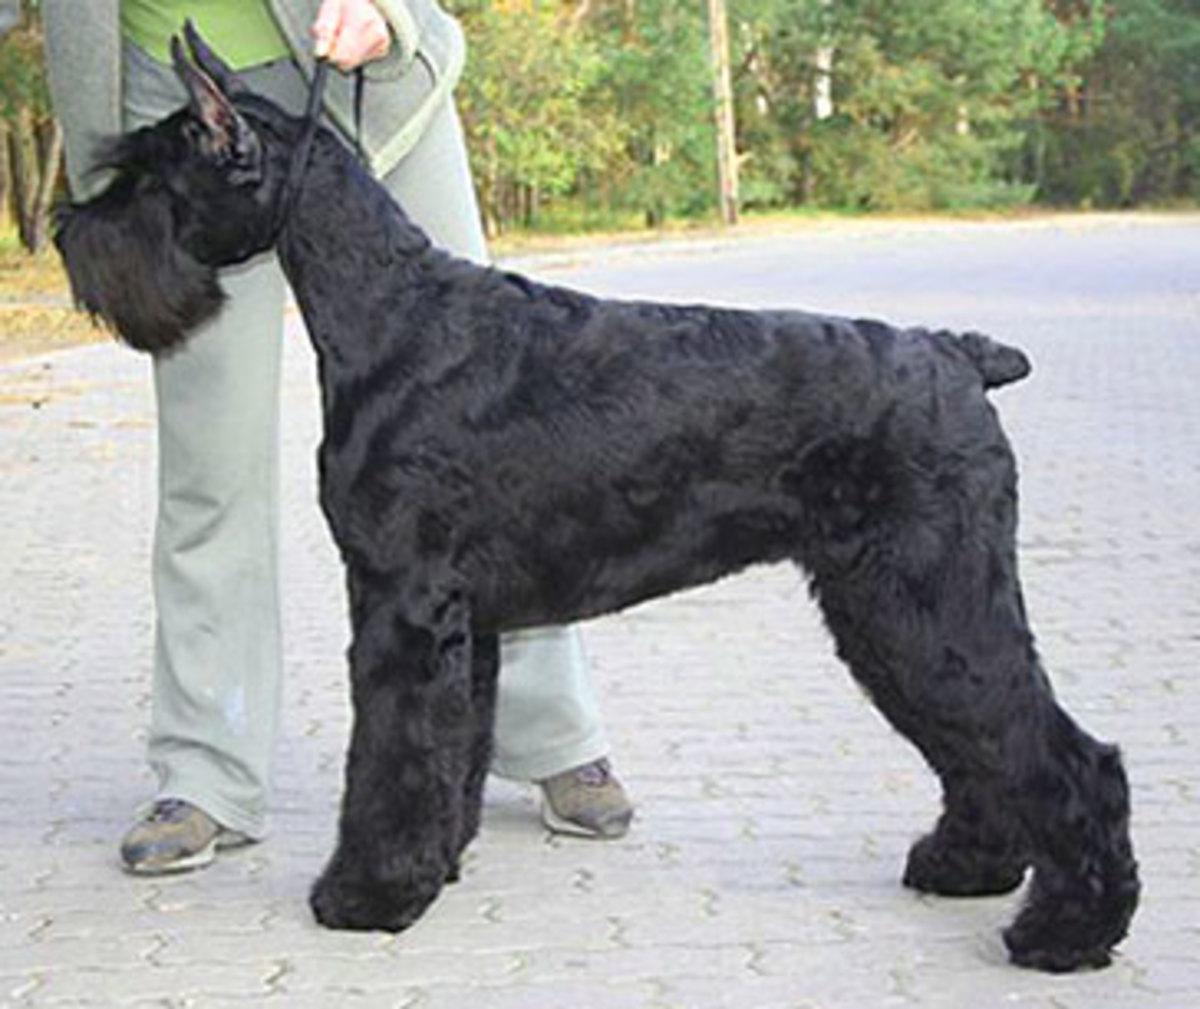 An adult Giant Schnauzer.